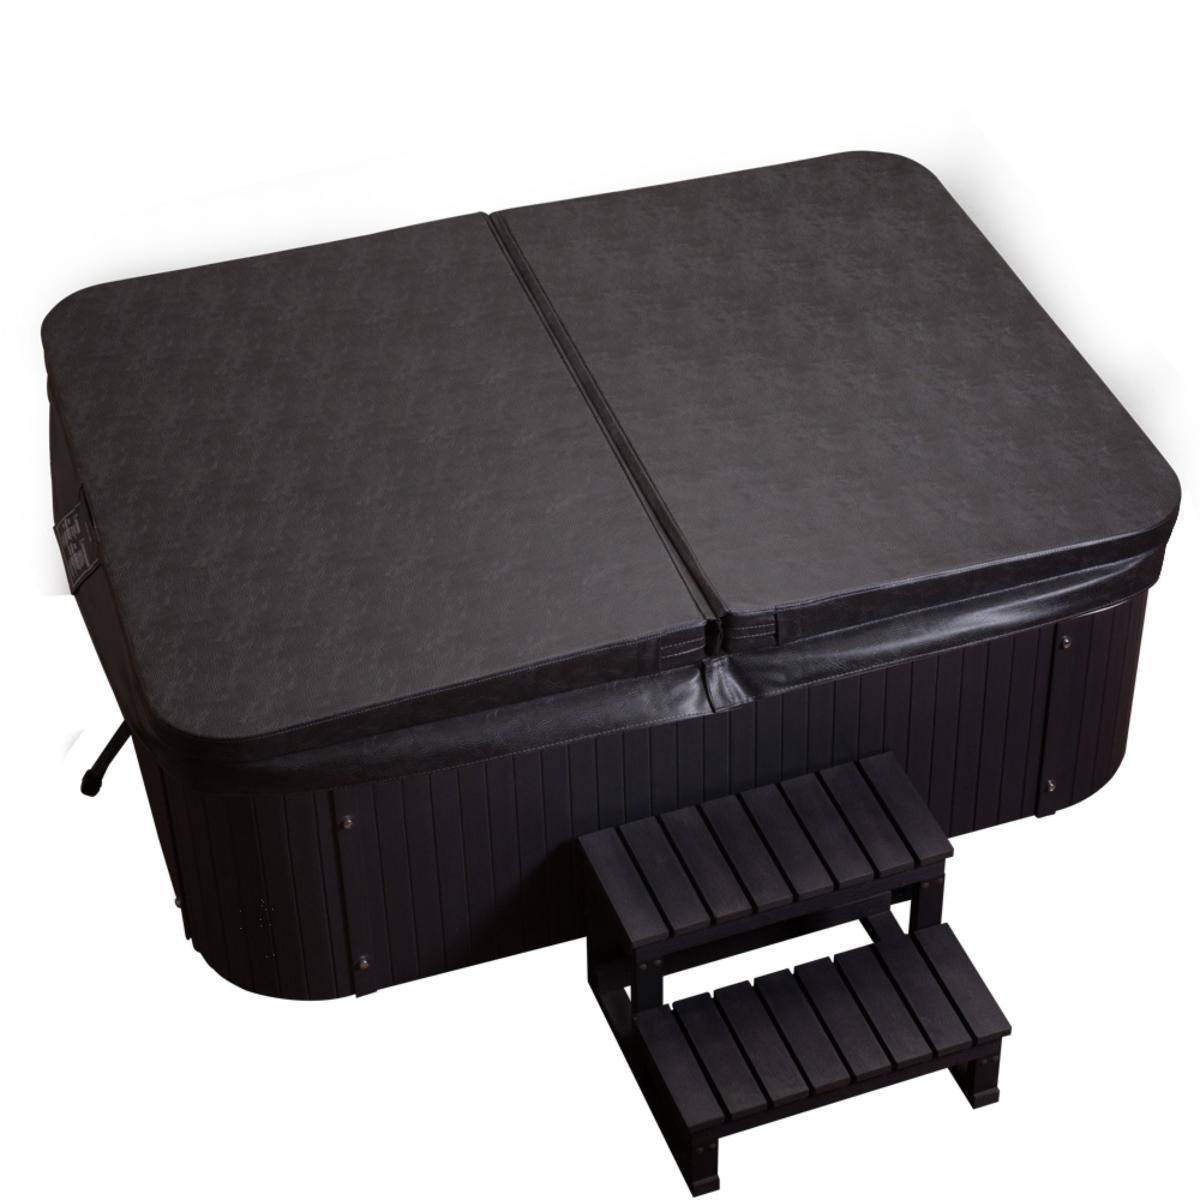 hot tub whirlpool outdoor 41 d sen heizung ozon g nstig. Black Bedroom Furniture Sets. Home Design Ideas